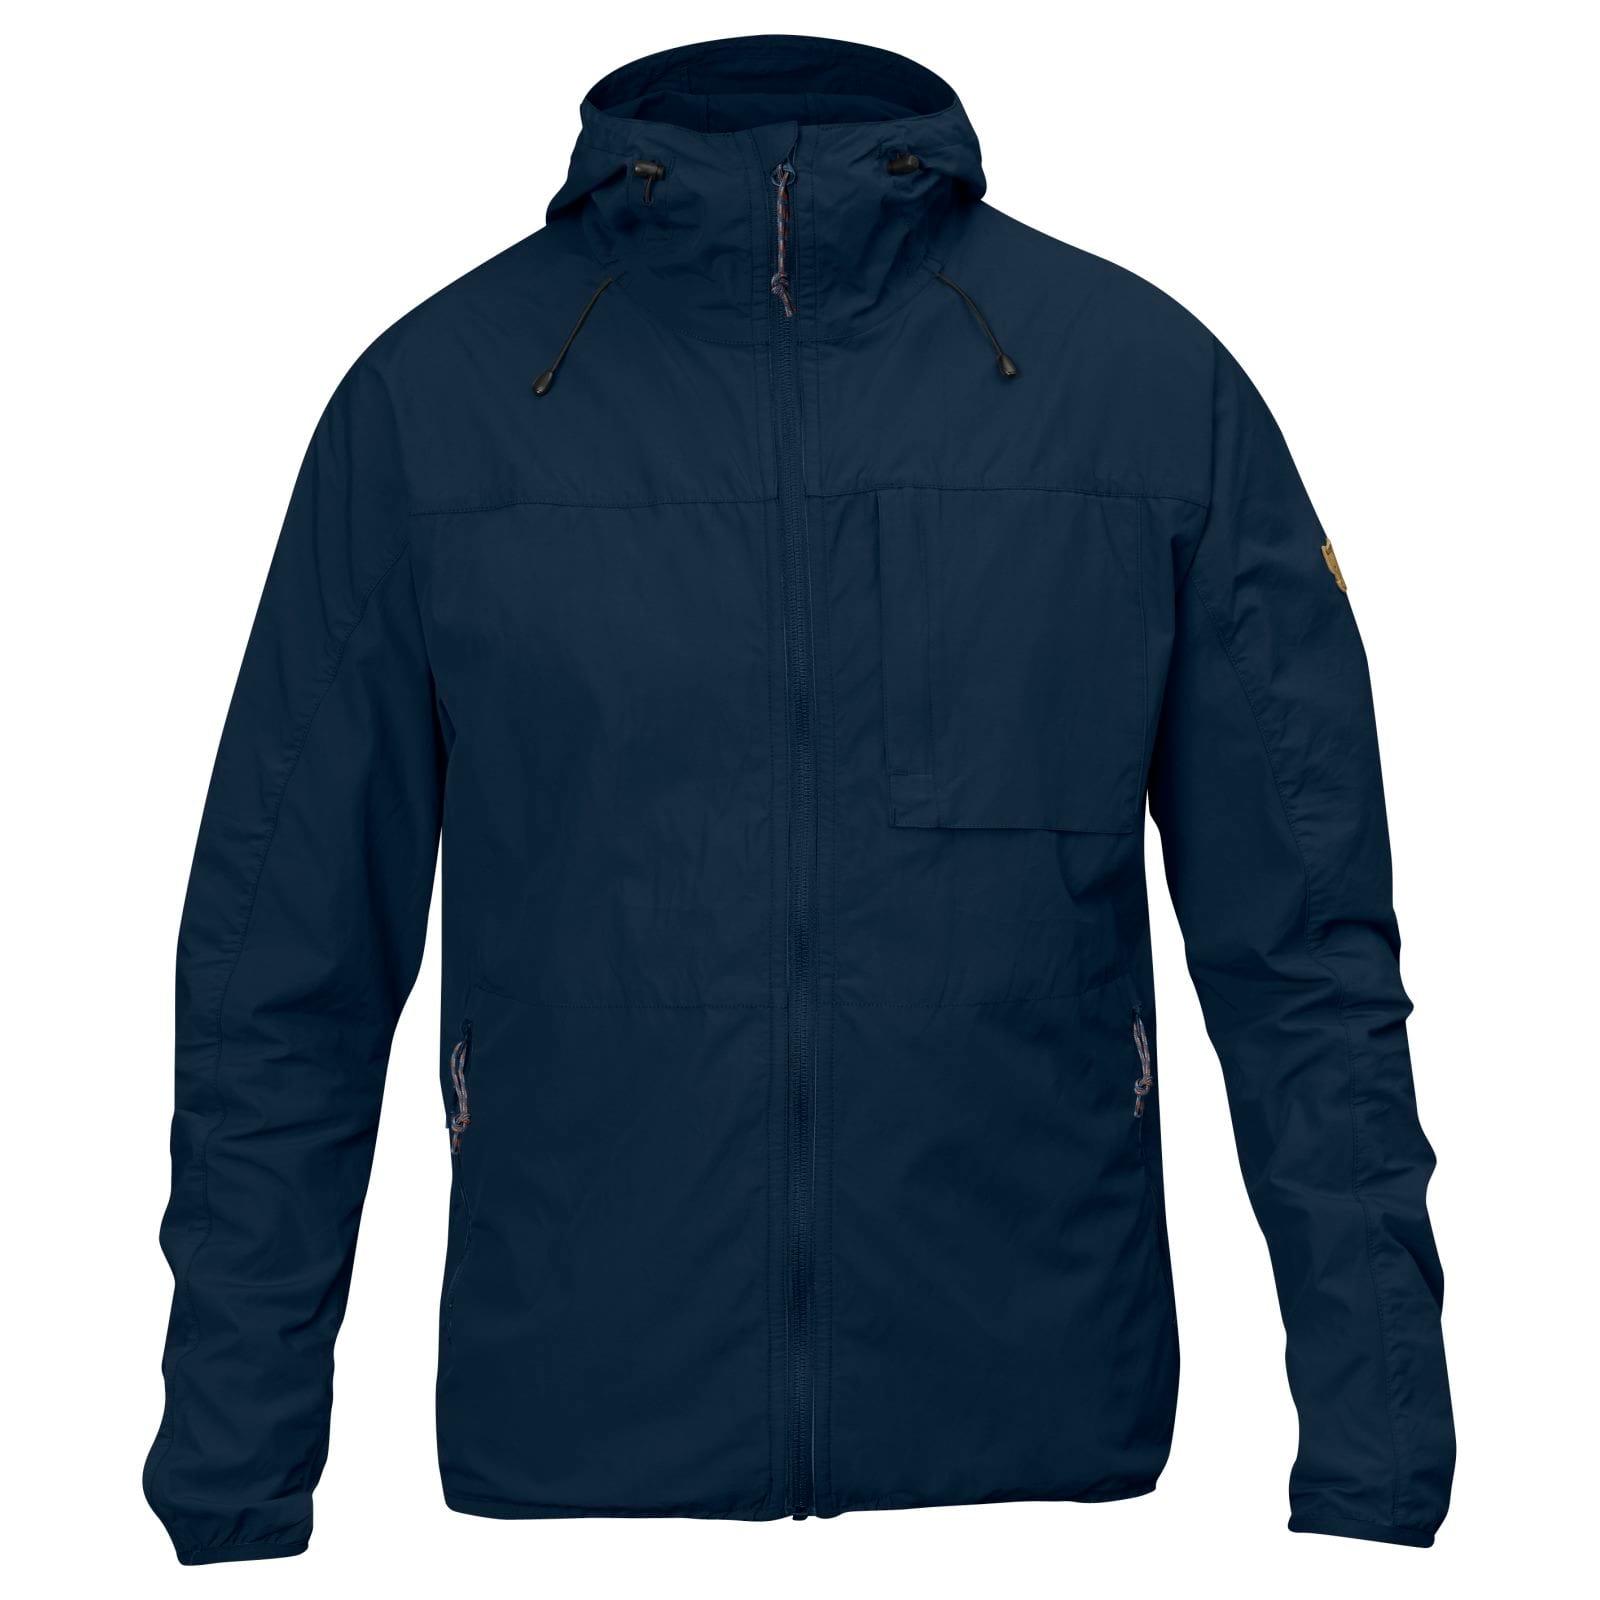 meet 5b5a0 dce35 high coast wind jacket